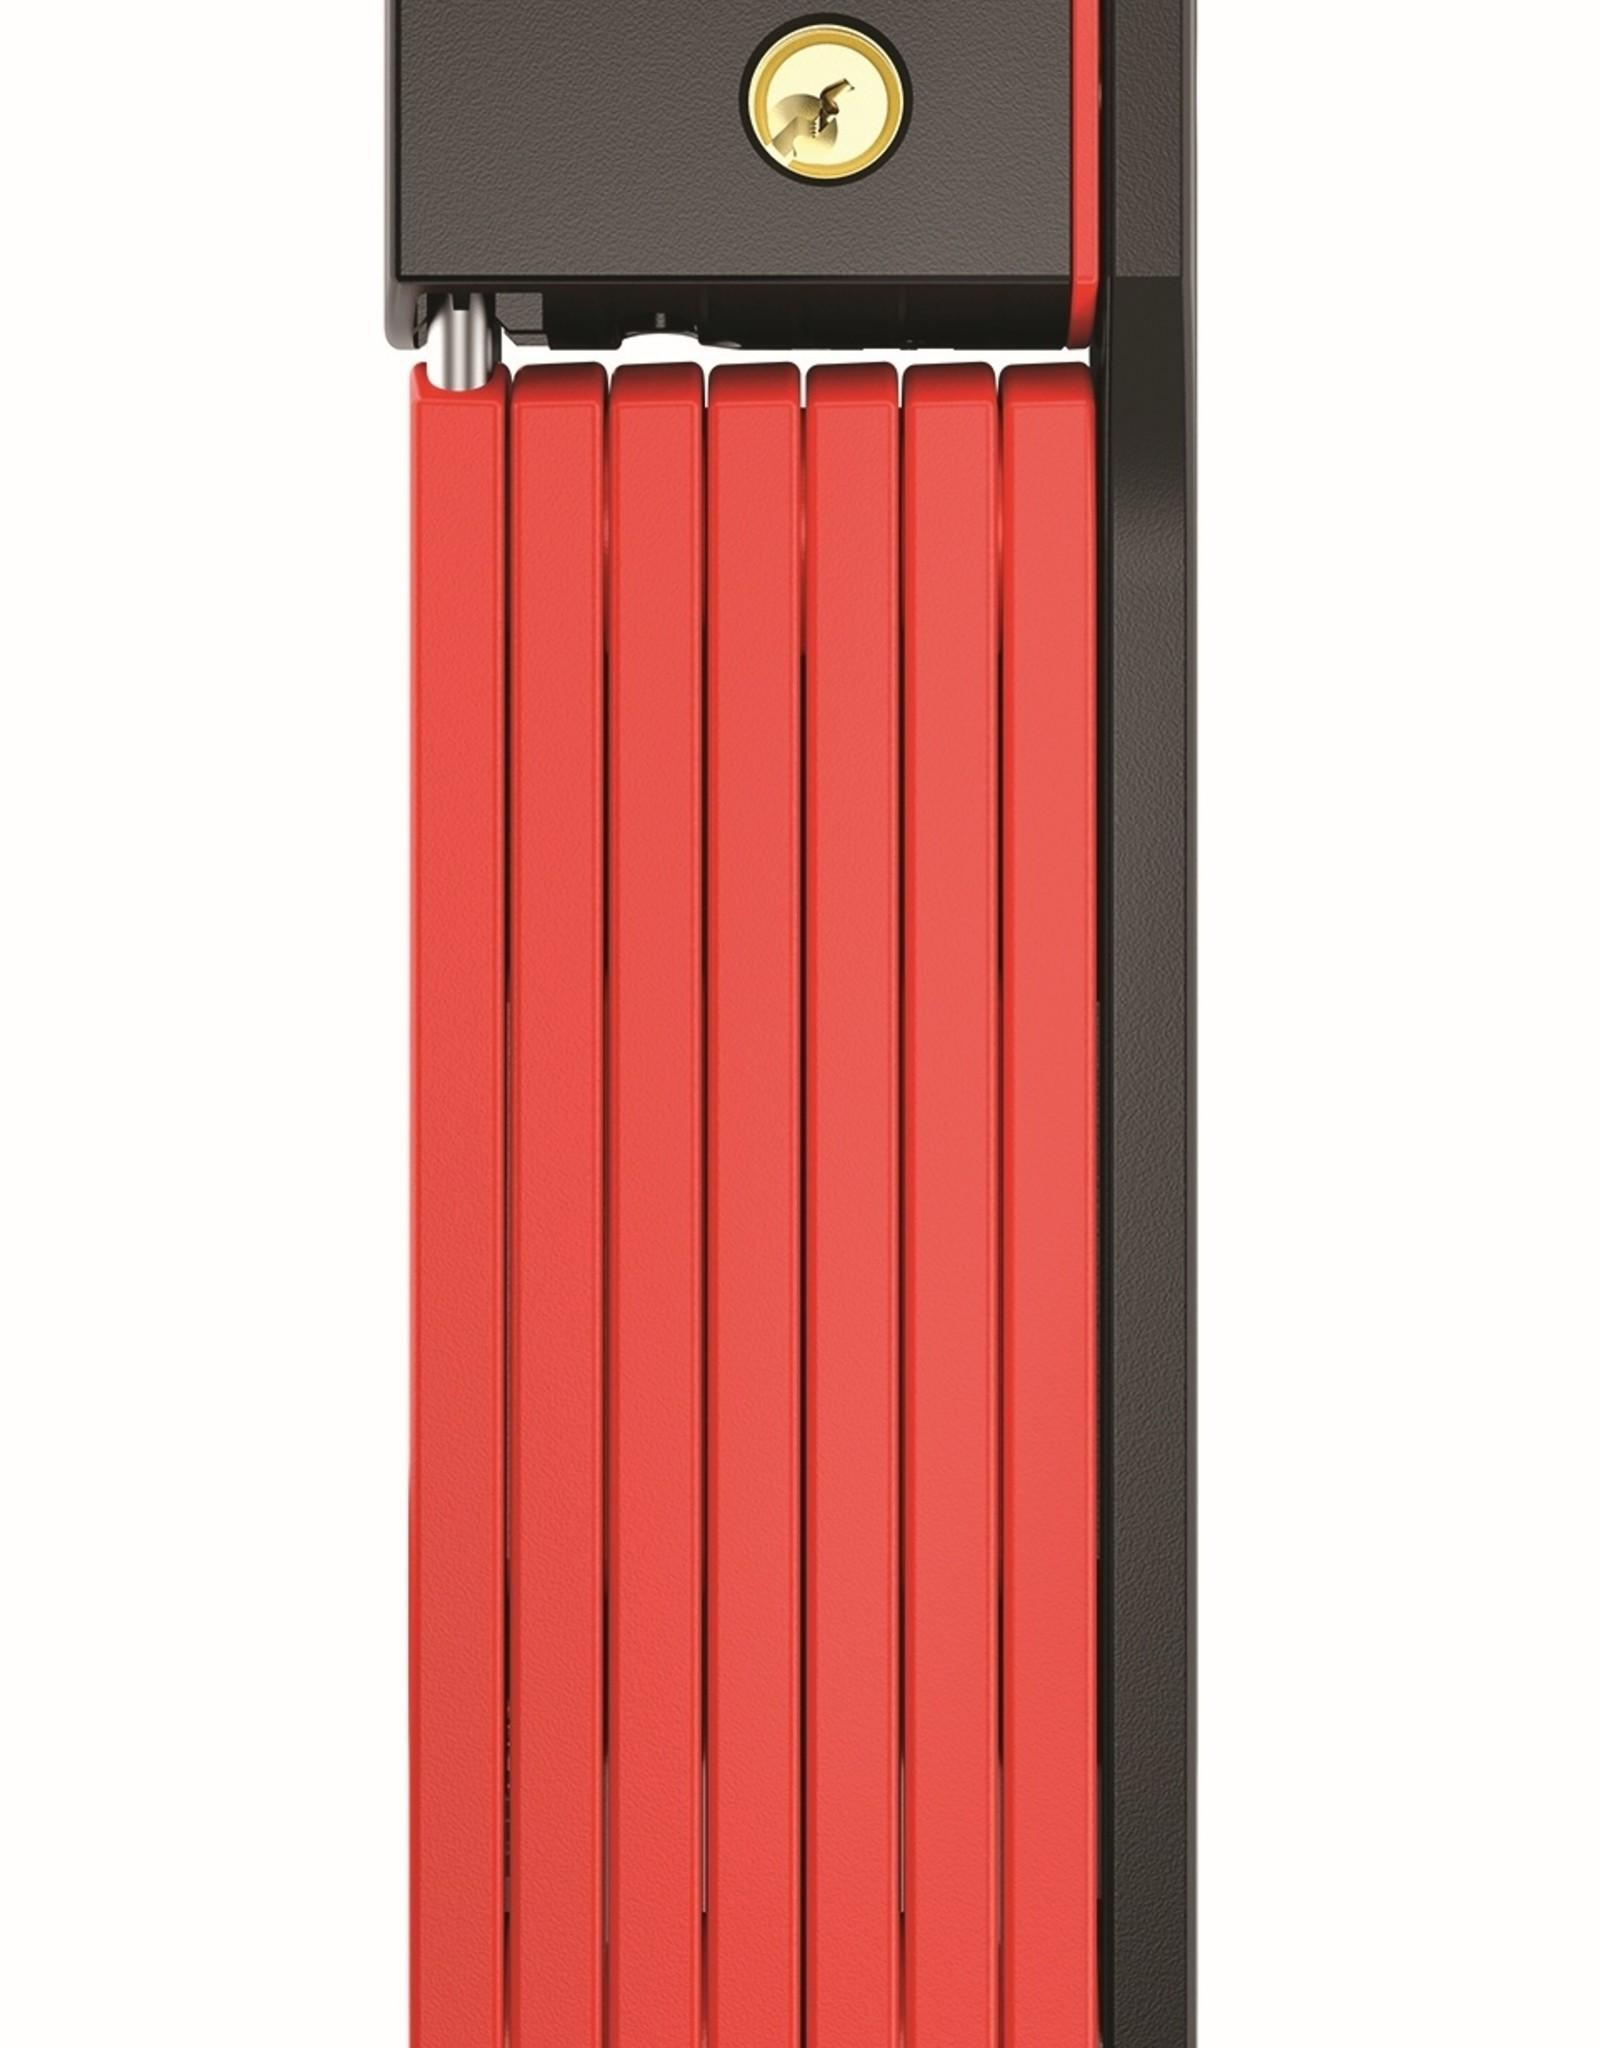 Abus, Bordo uGrip 5700 SH, Folding Lock, Key, 80cm, 2.6', 5mm, Red